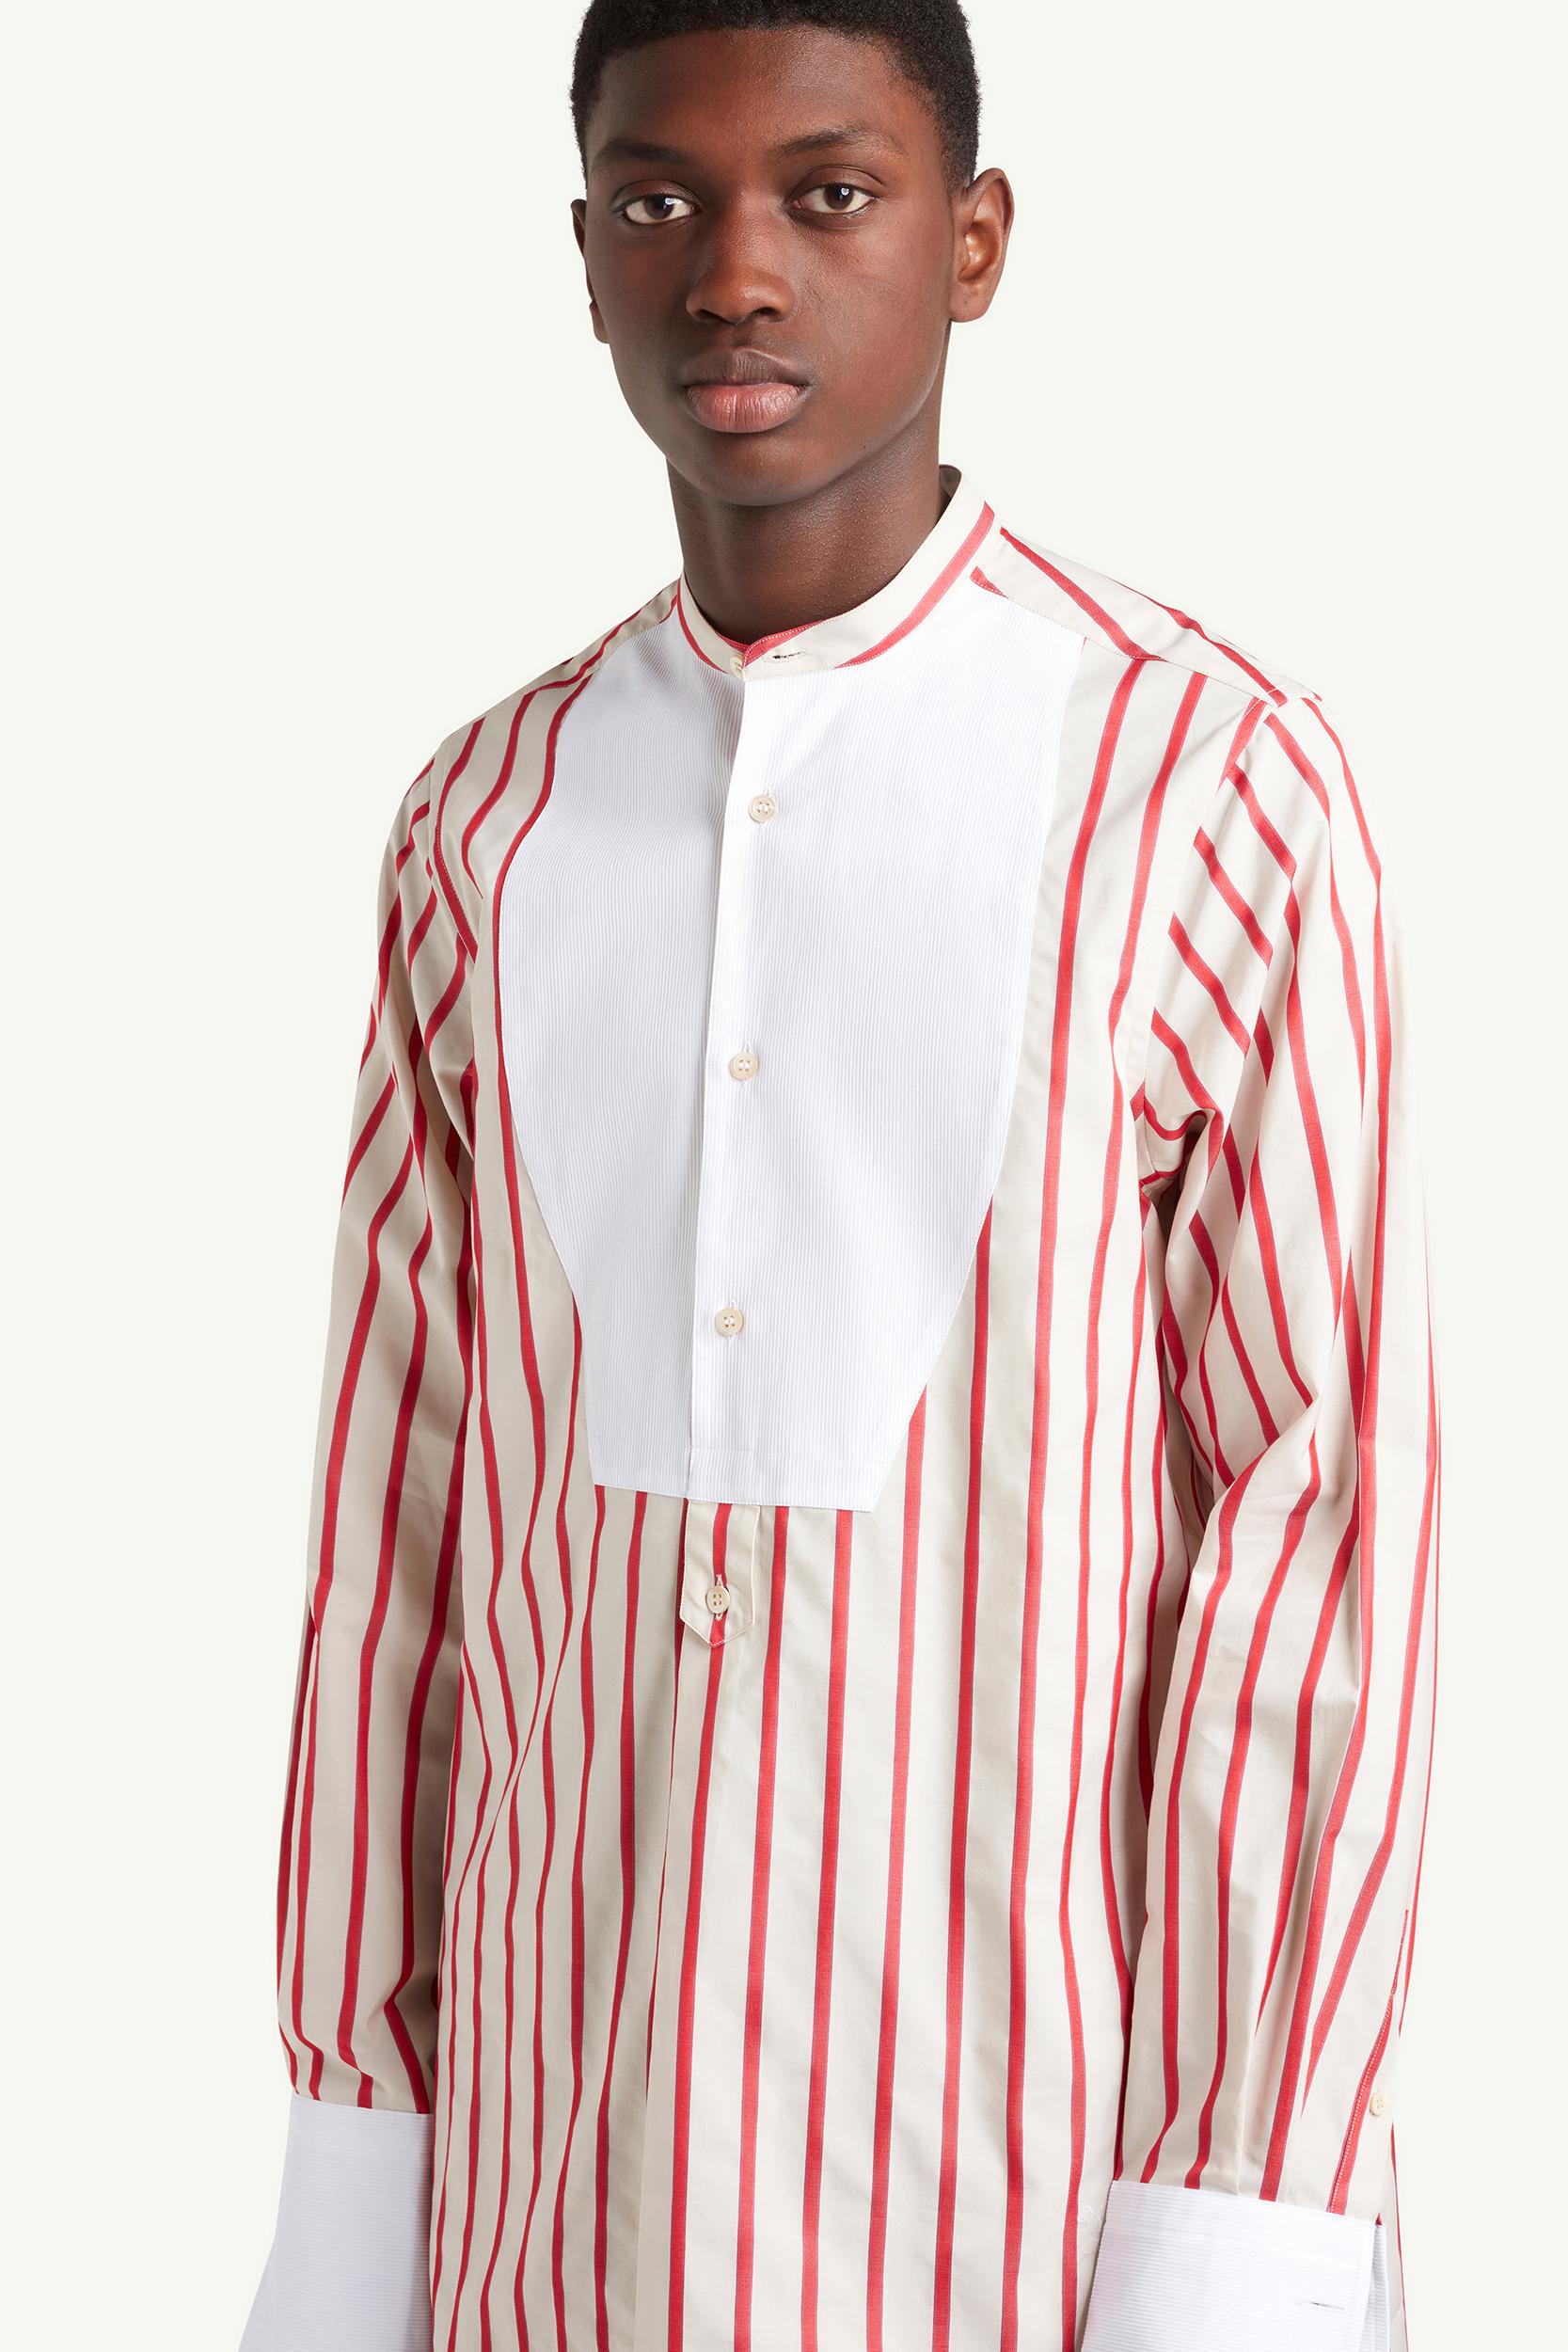 Wales Bonner Menswear Model wearing a red striped shirt | LRP